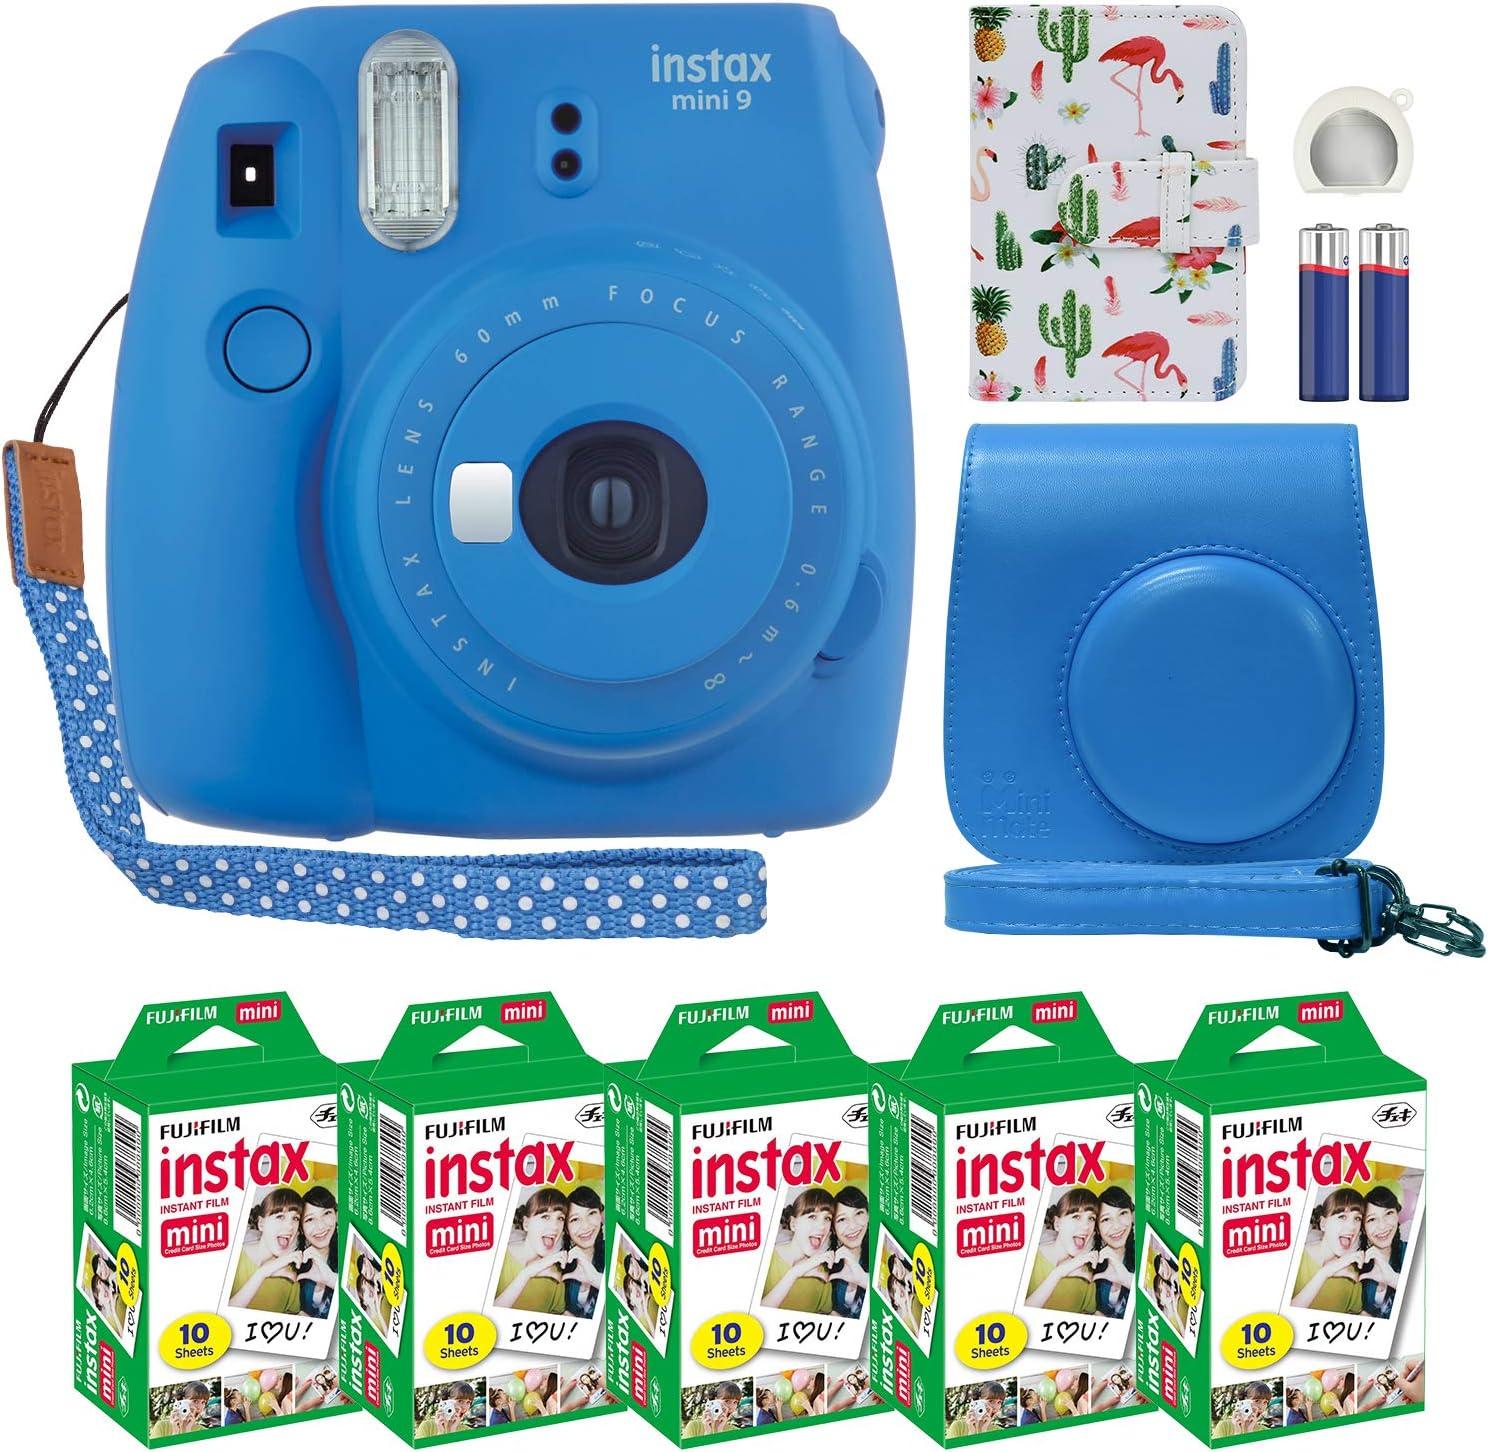 Fujifilm Instax Mini 9 Instant Camera Cobalt Blue with Custom Case + Fuji Instax Film Value Pack (50 Sheets) Flamingo Designer Photo Album for Fuji instax Mini 9 Photos